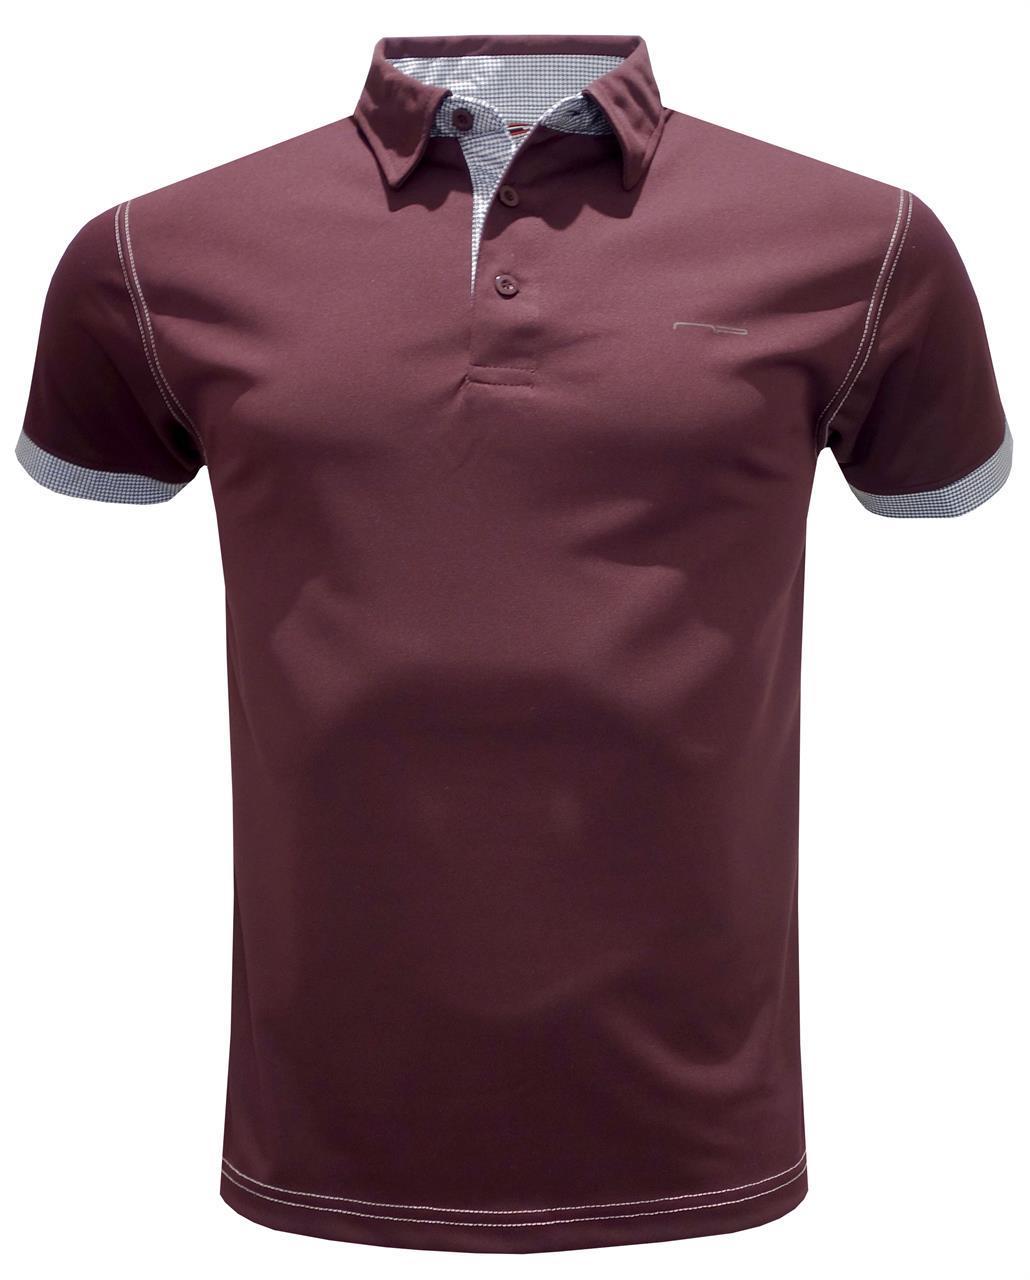 Shirt 1806 Plum  L